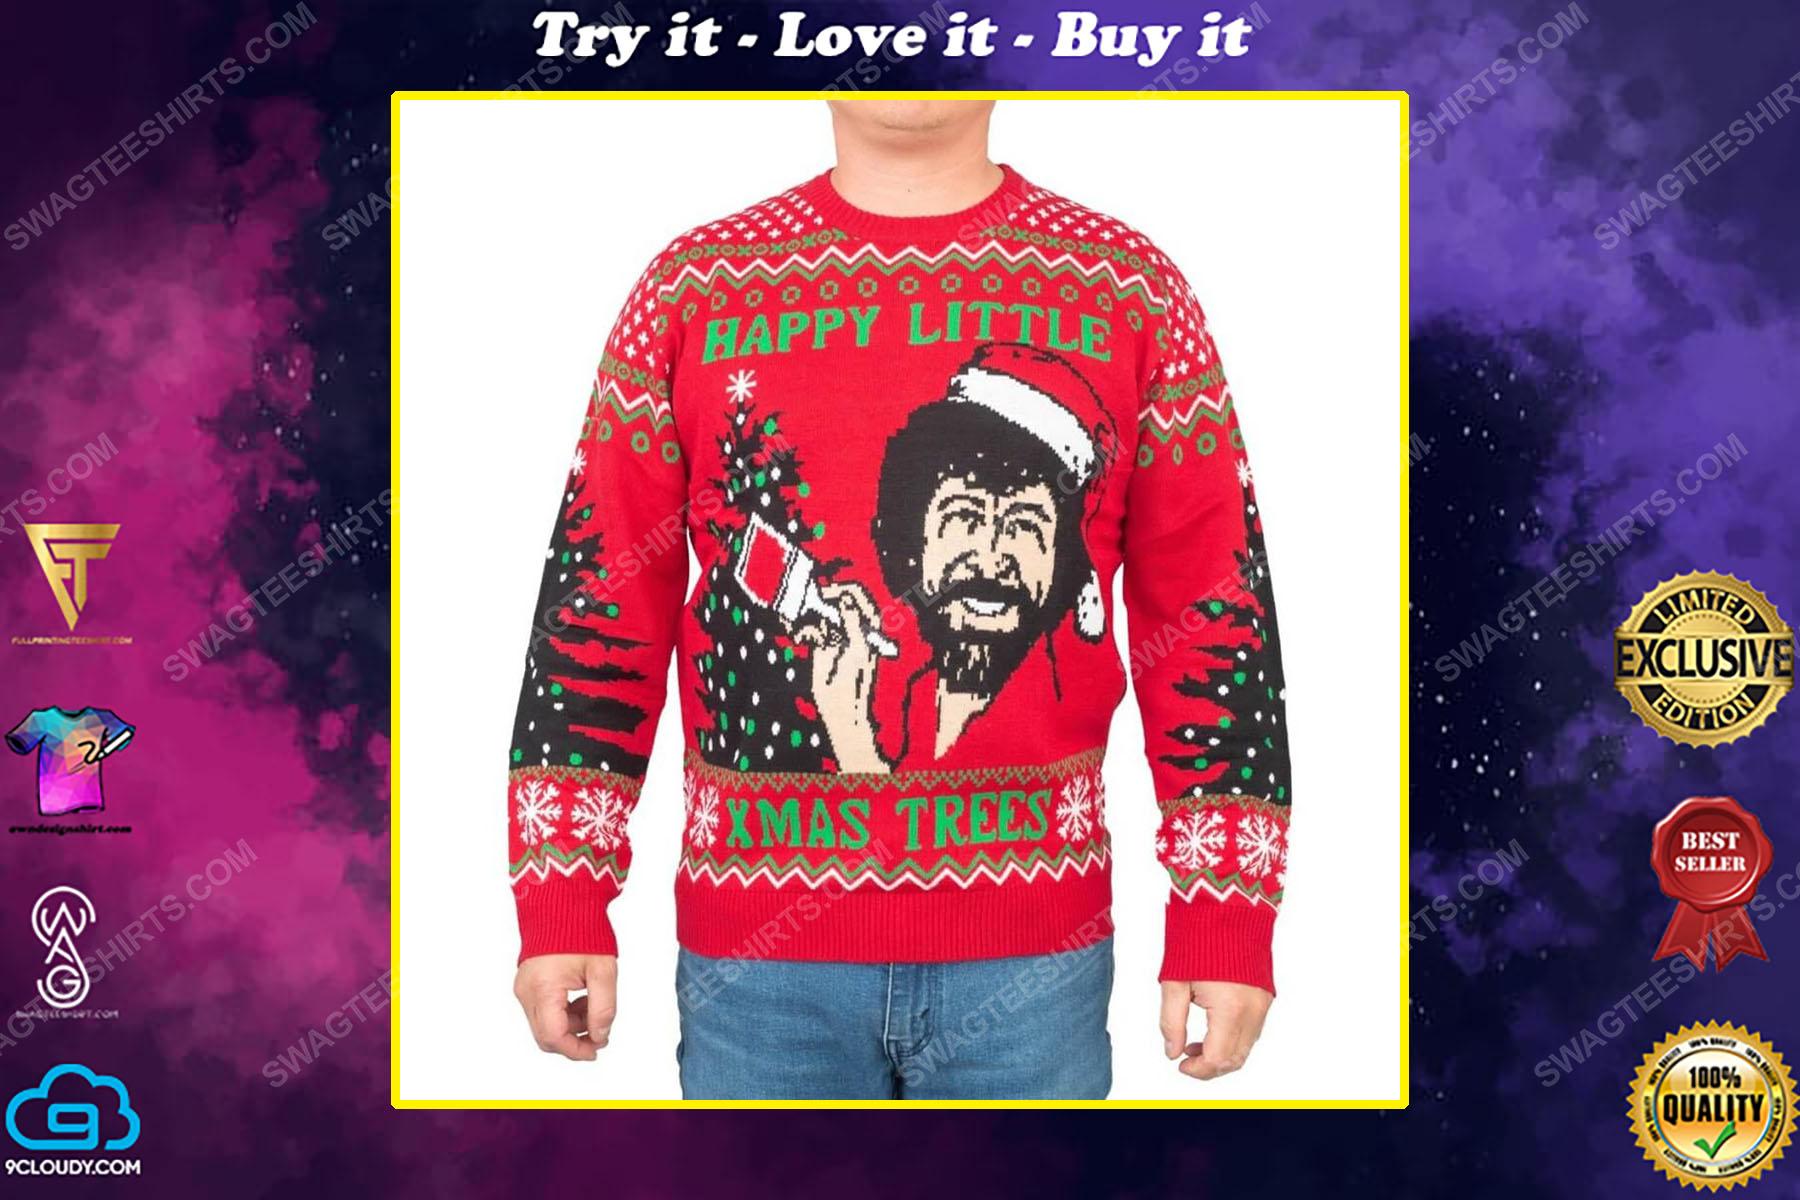 Bob ross happy little xmas trees full print ugly christmas sweater